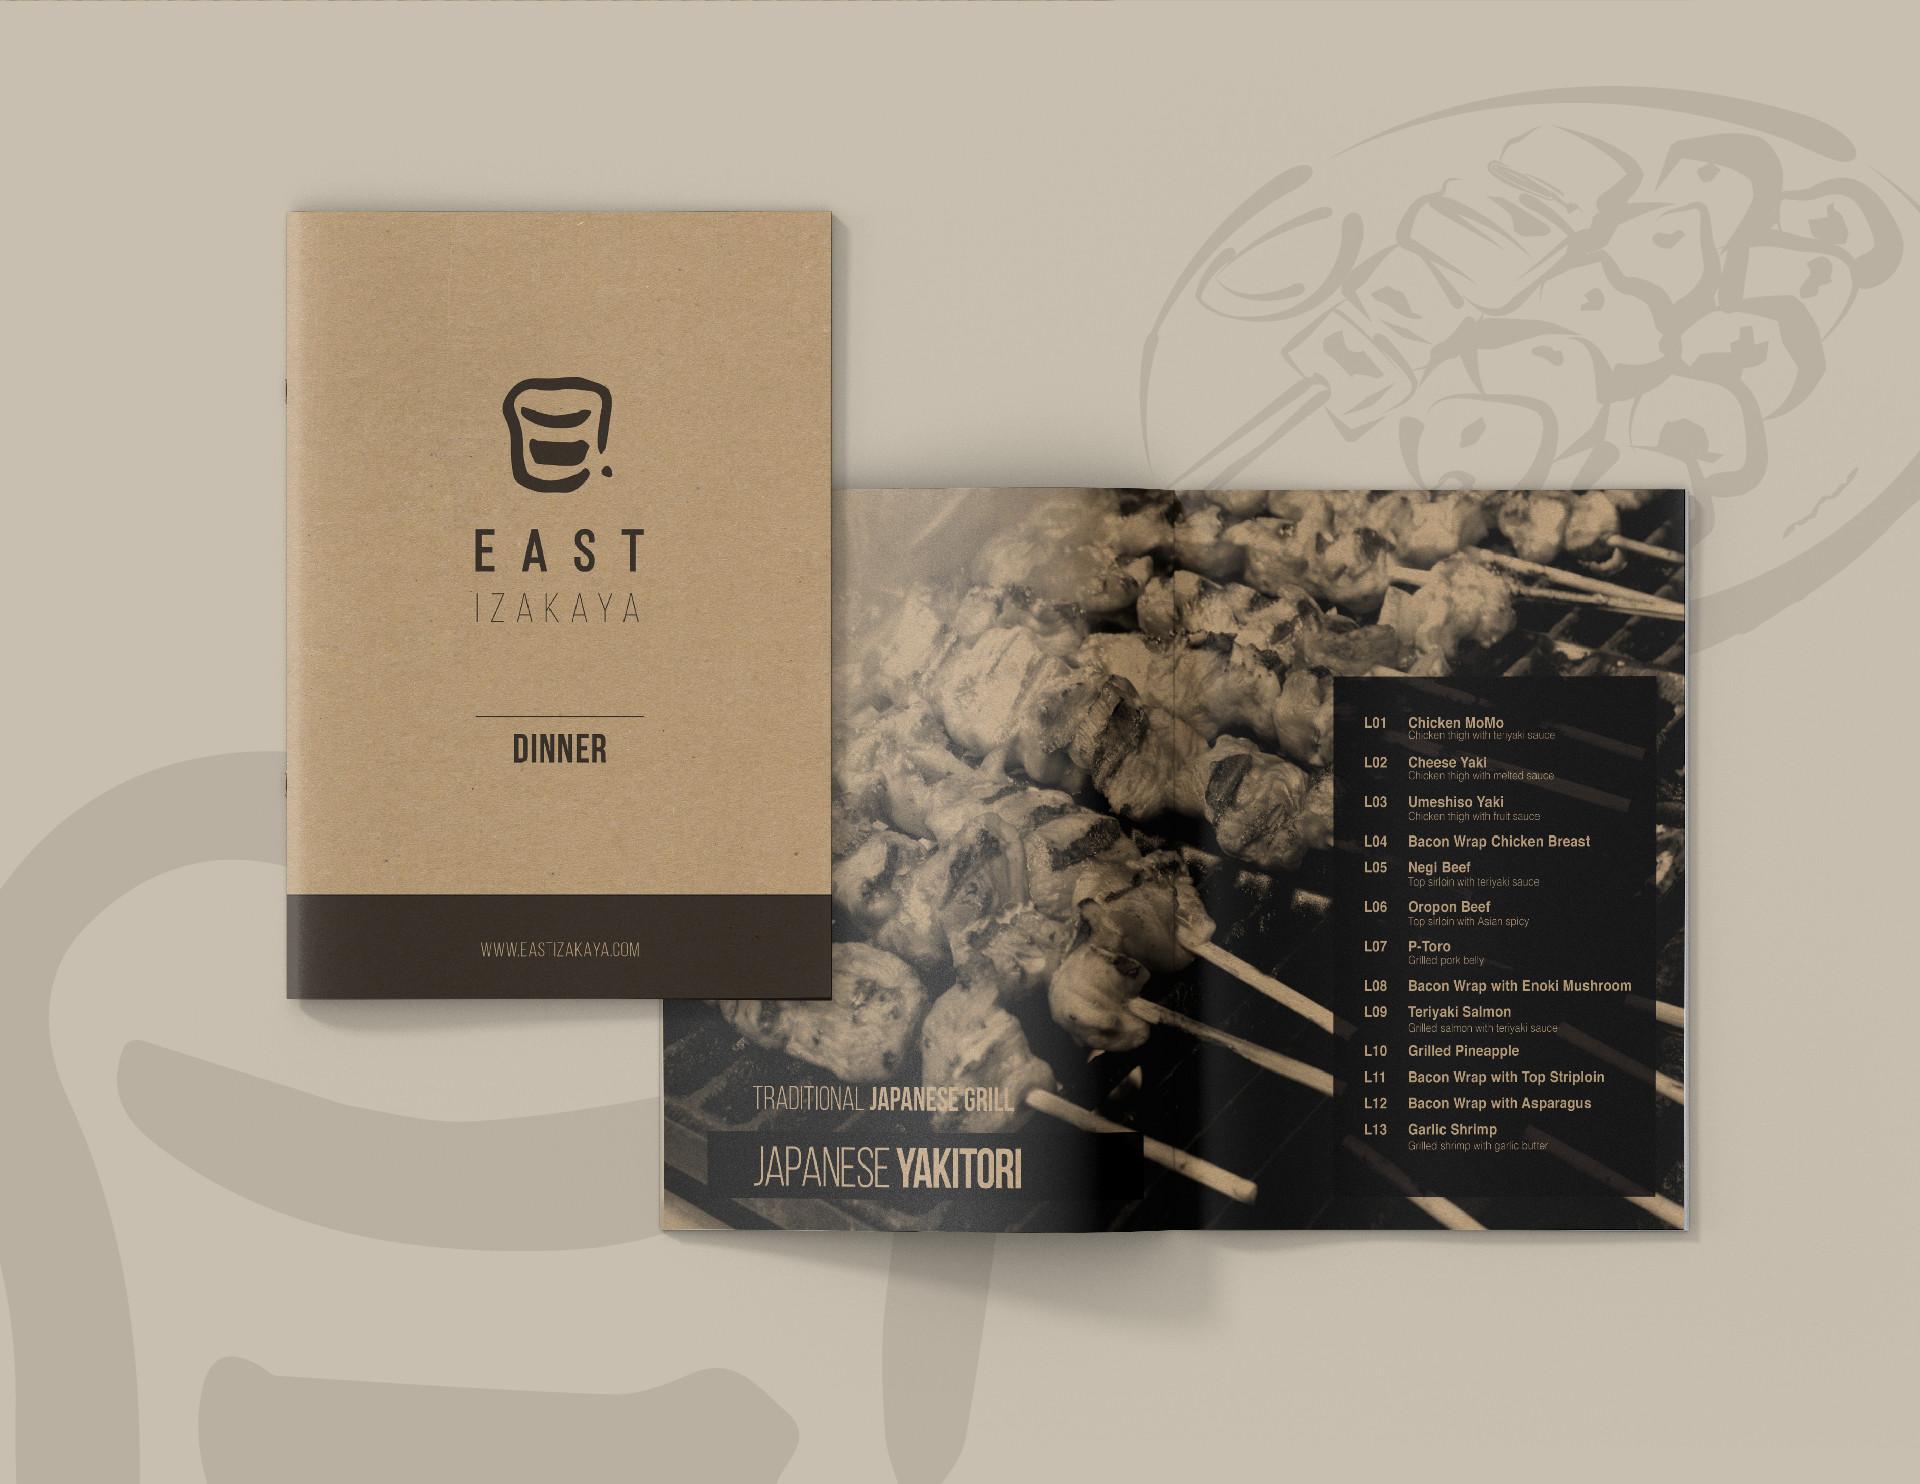 EAST_Web Brand Image_3.jpg